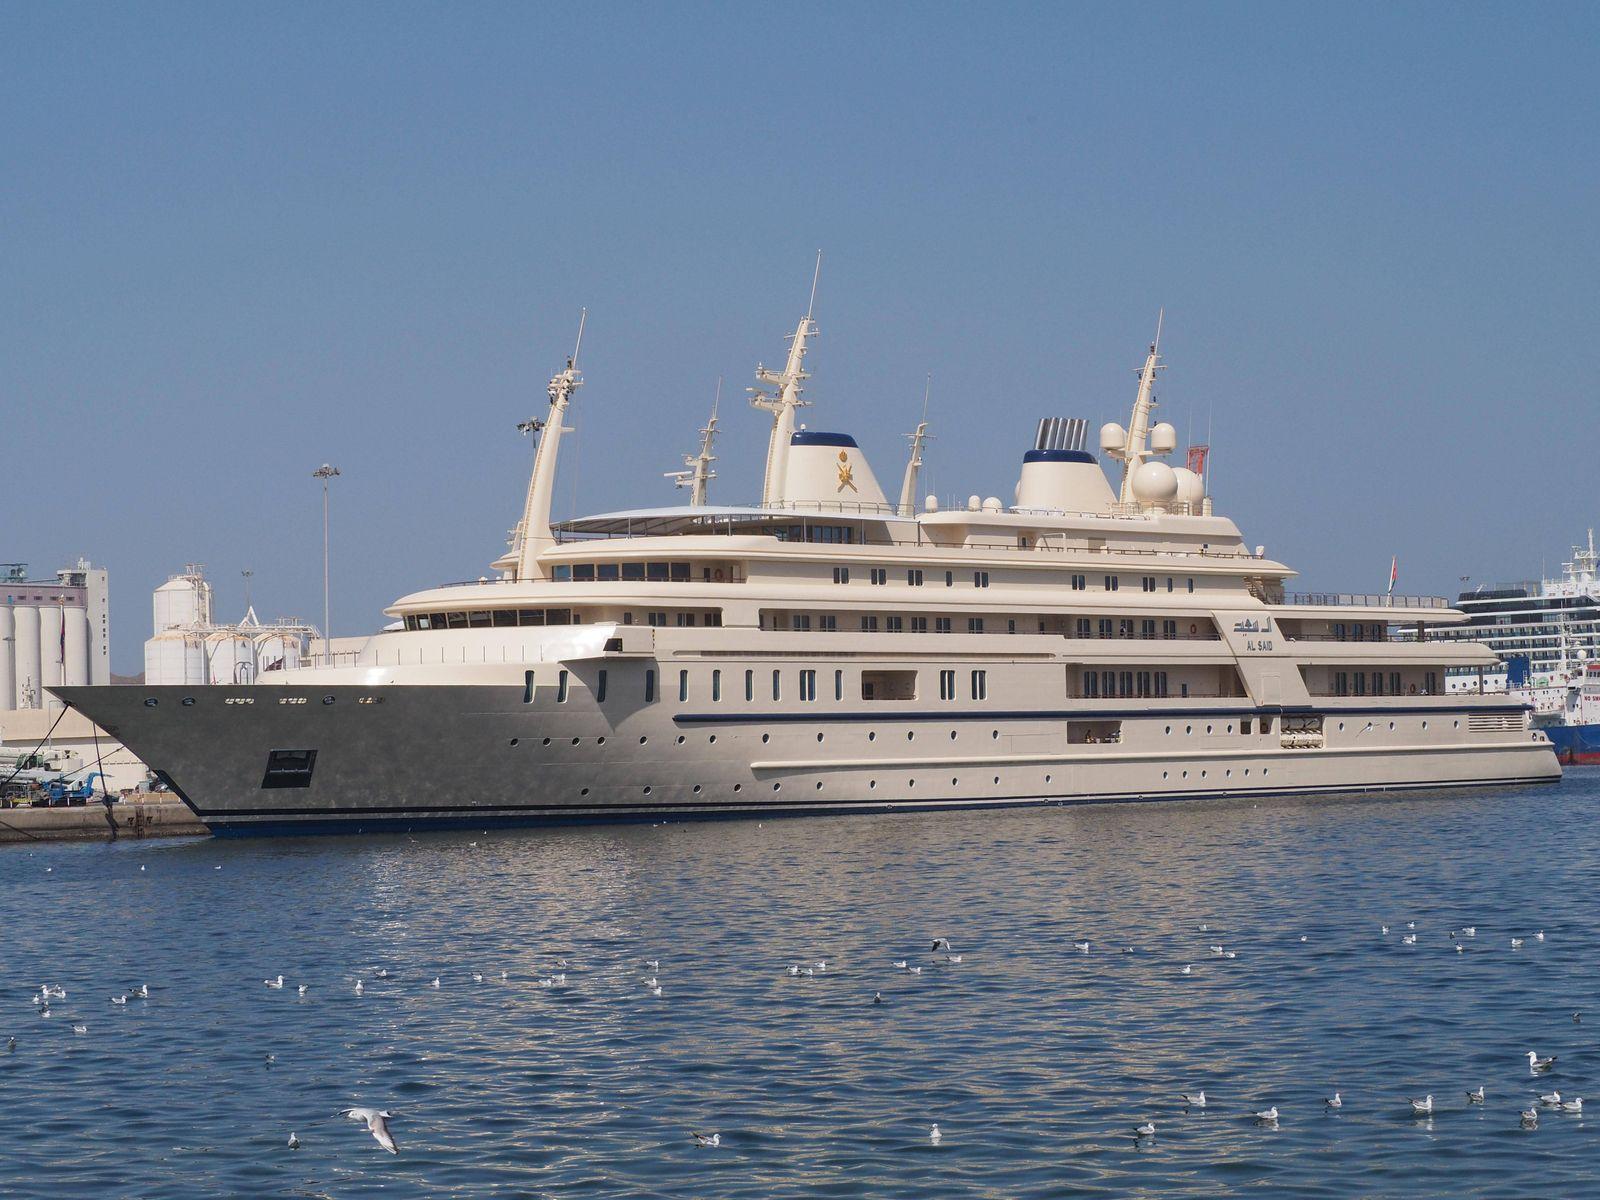 Mega Yacht Al Said im Hafen Yacht des Sultans von Oman Maskat Oman Asien *** Mega Yacht Al Said